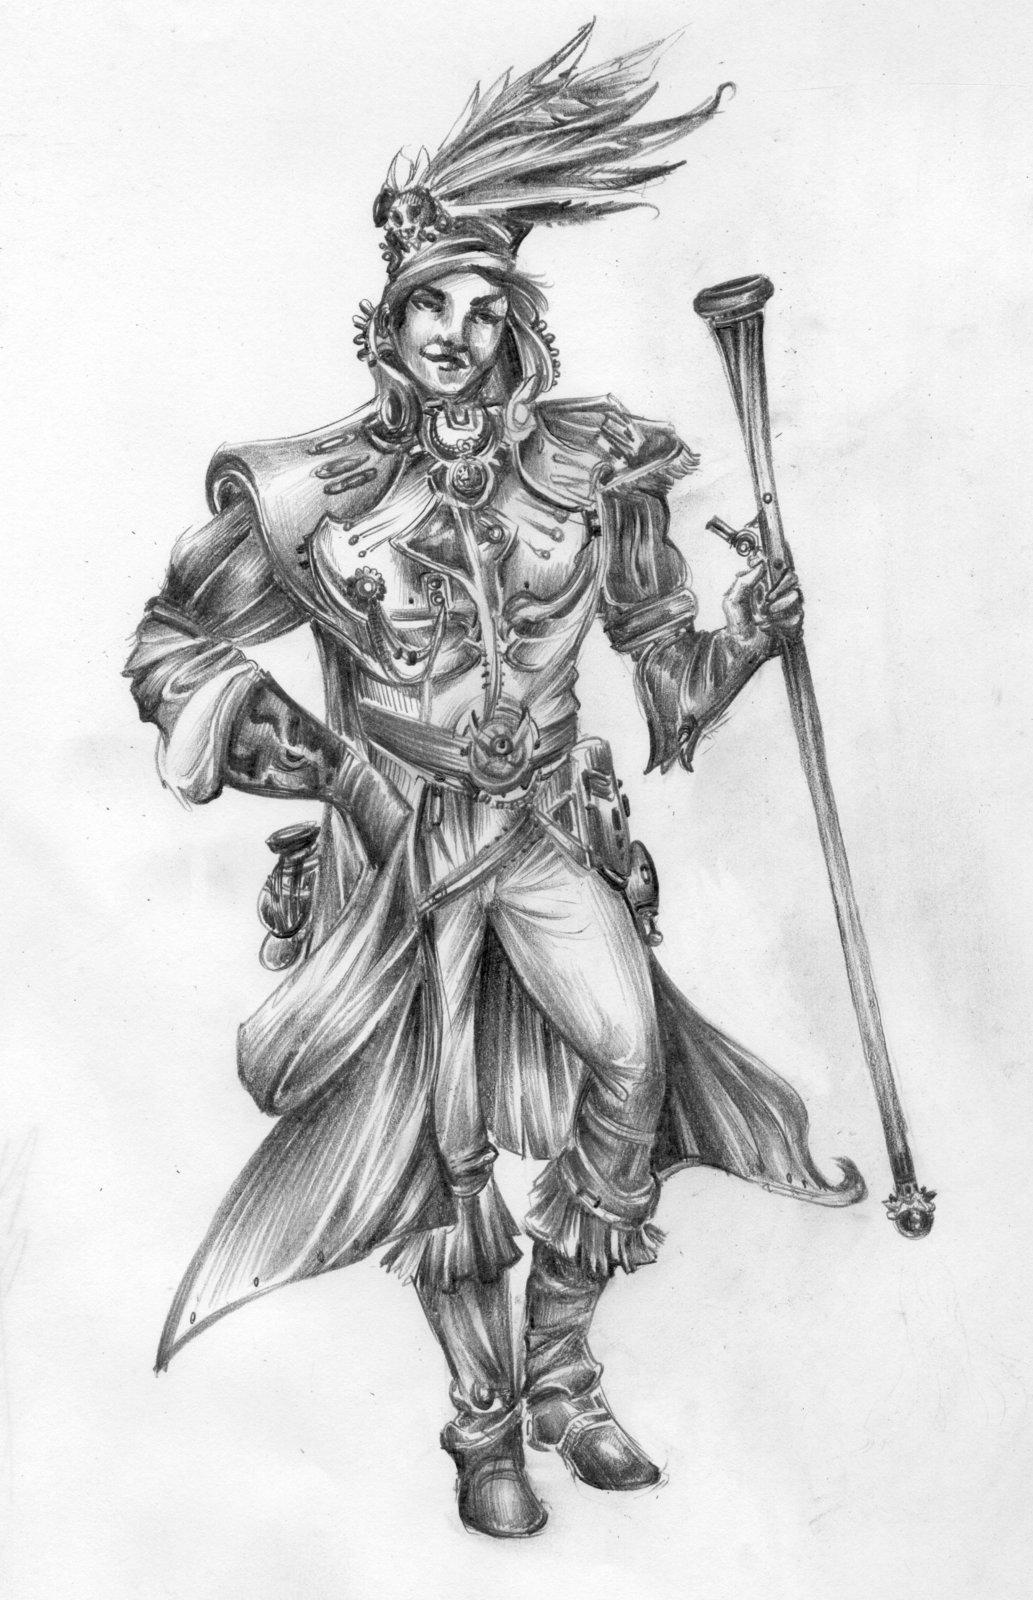 Sketchbook Characters (pencil)